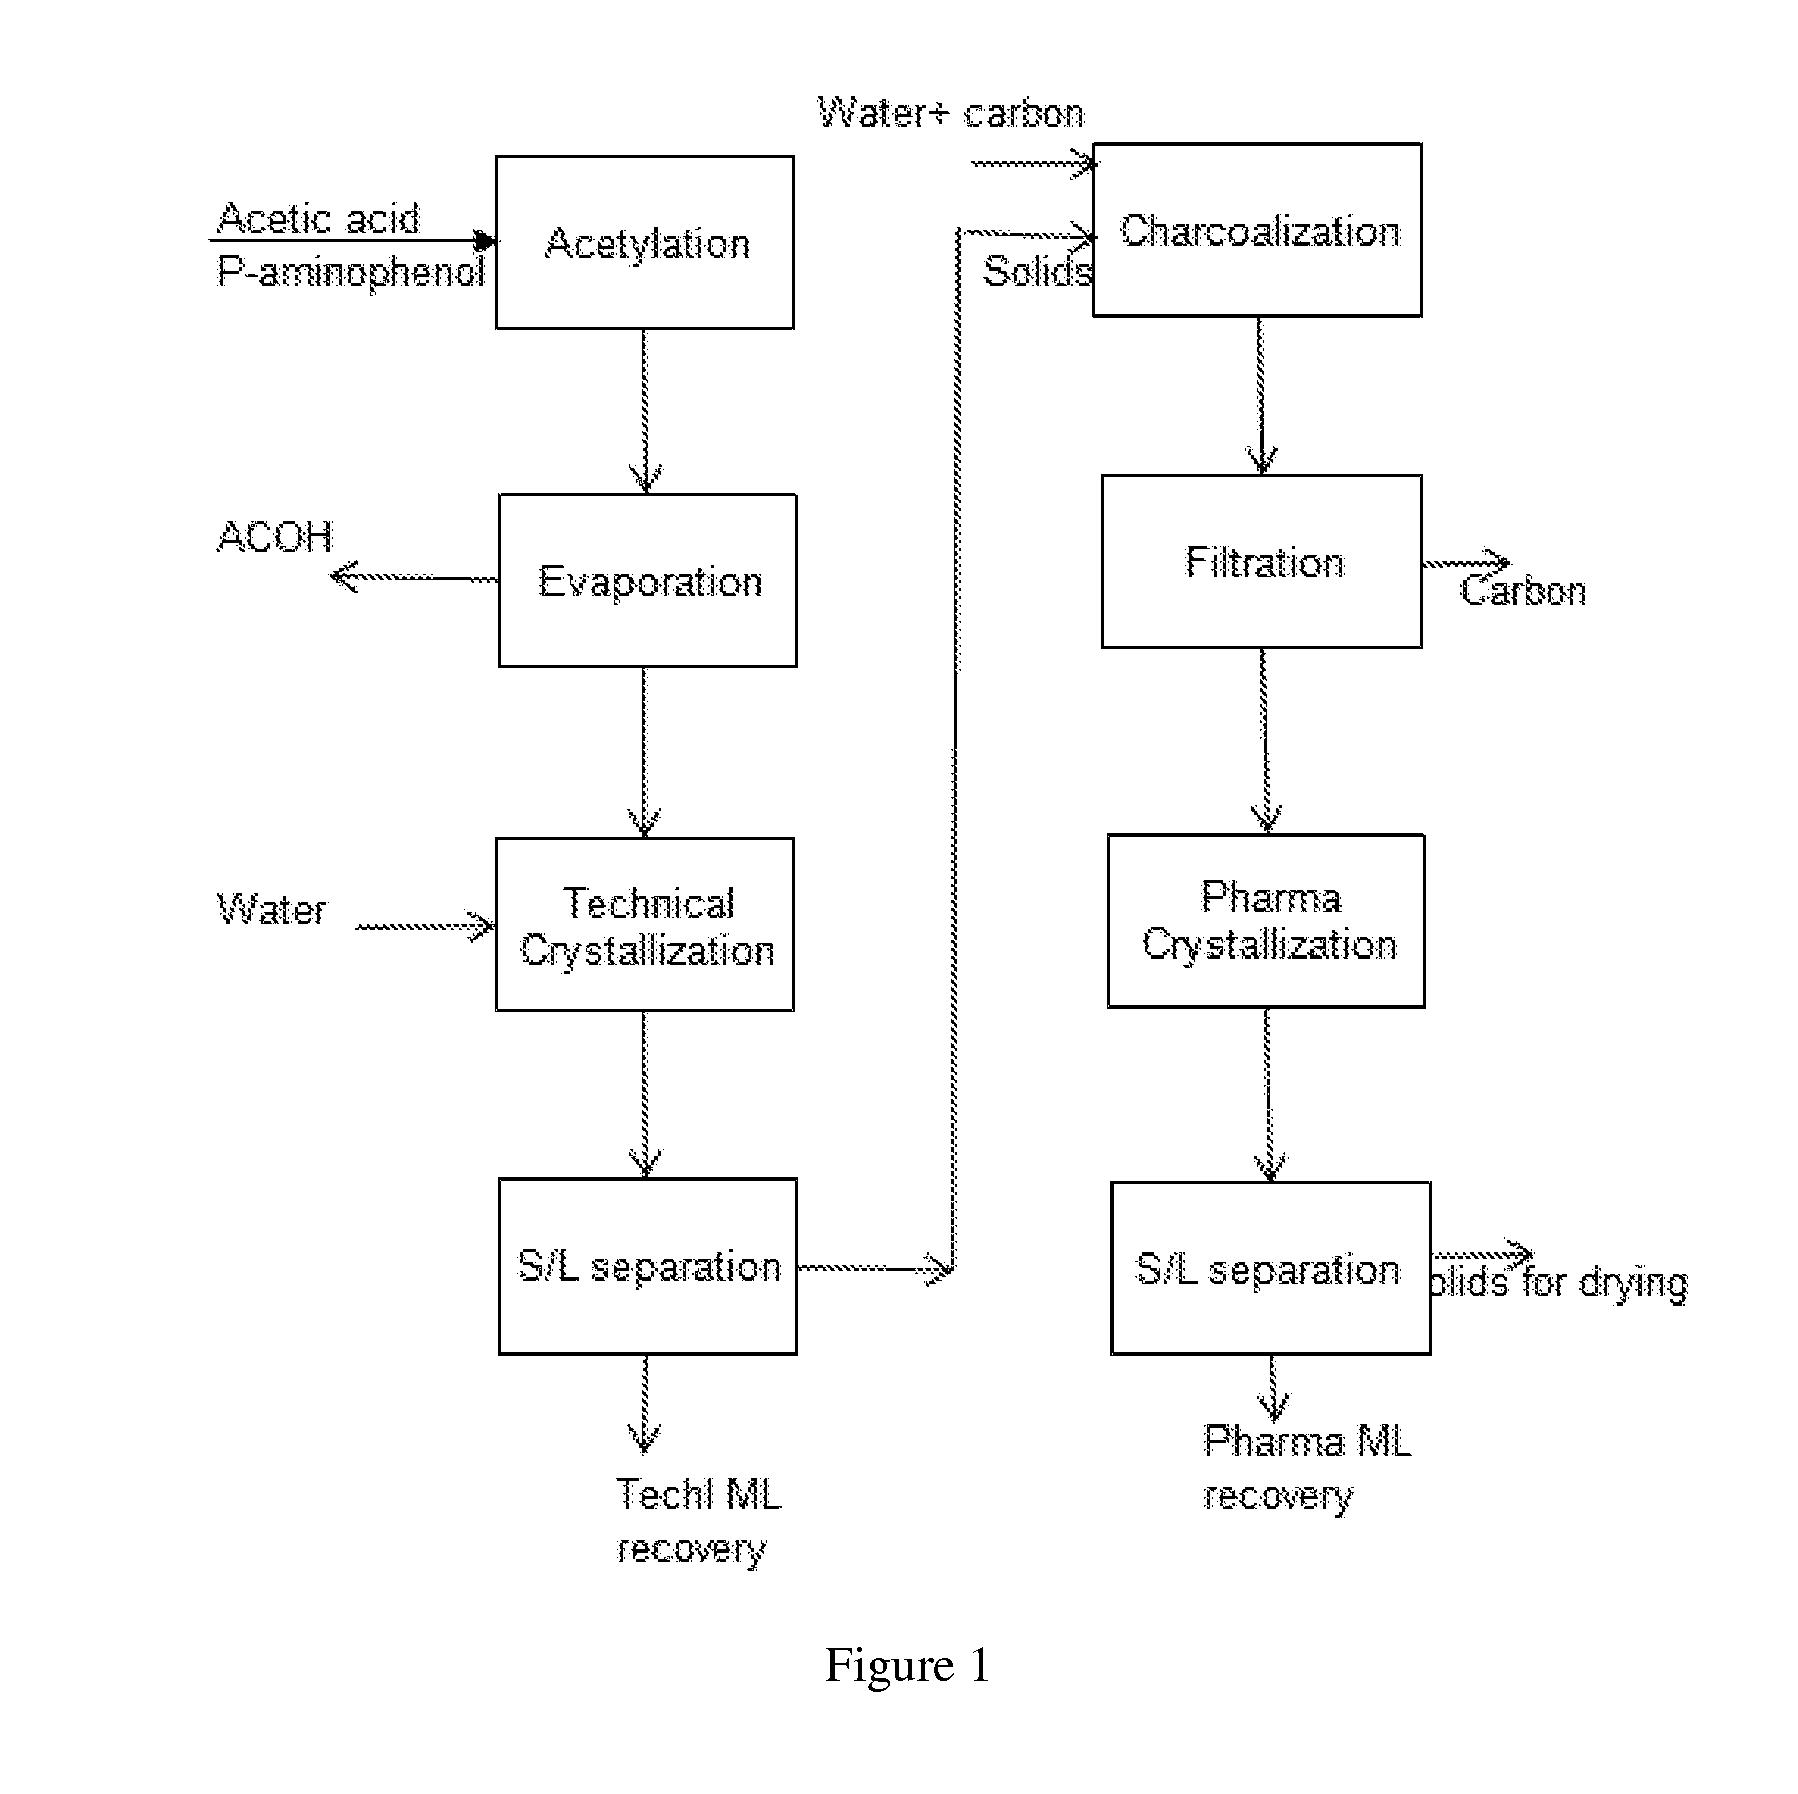 Paracetamol synthesis patent photosynthesis rainforest importance